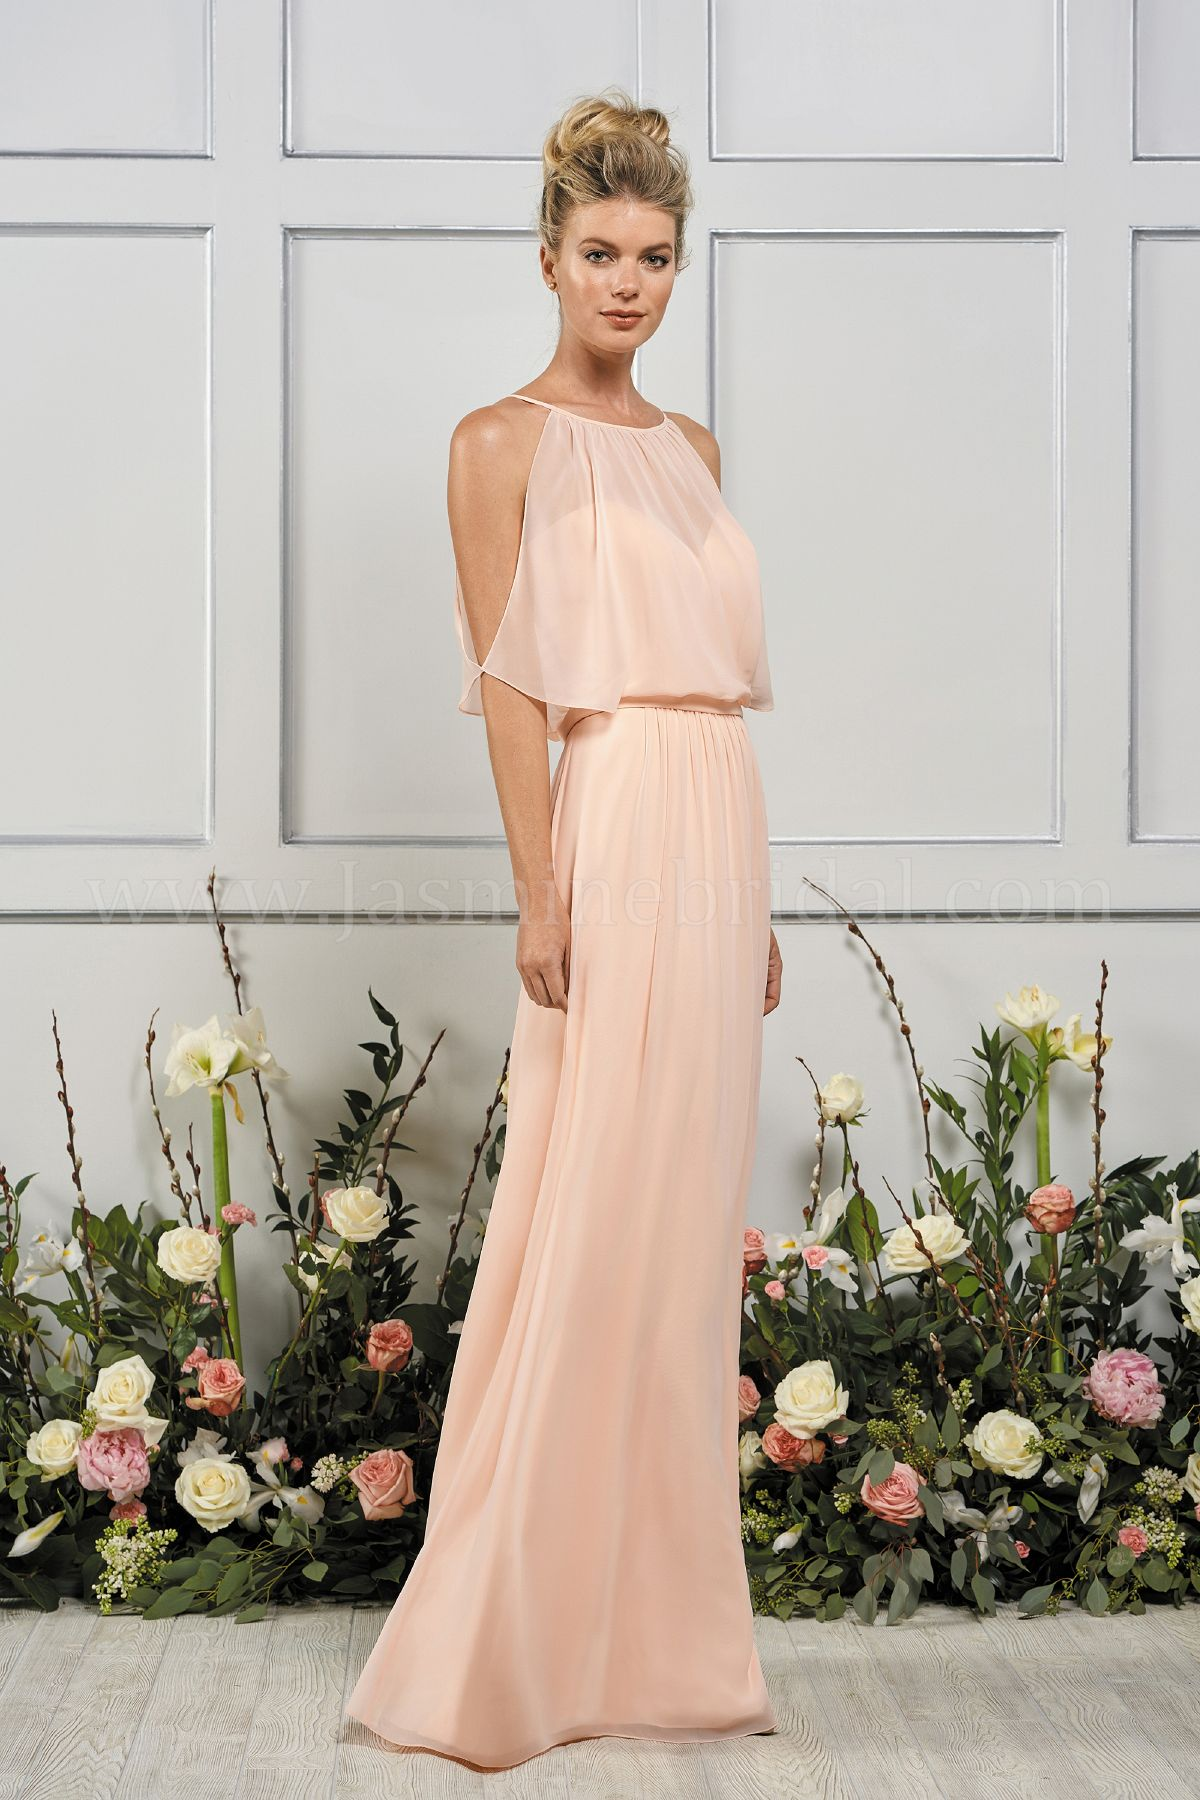 22a1fc5465f23 B193060 Long Sweetheart Neckline Poly Chiffon Bridesmaid Dress